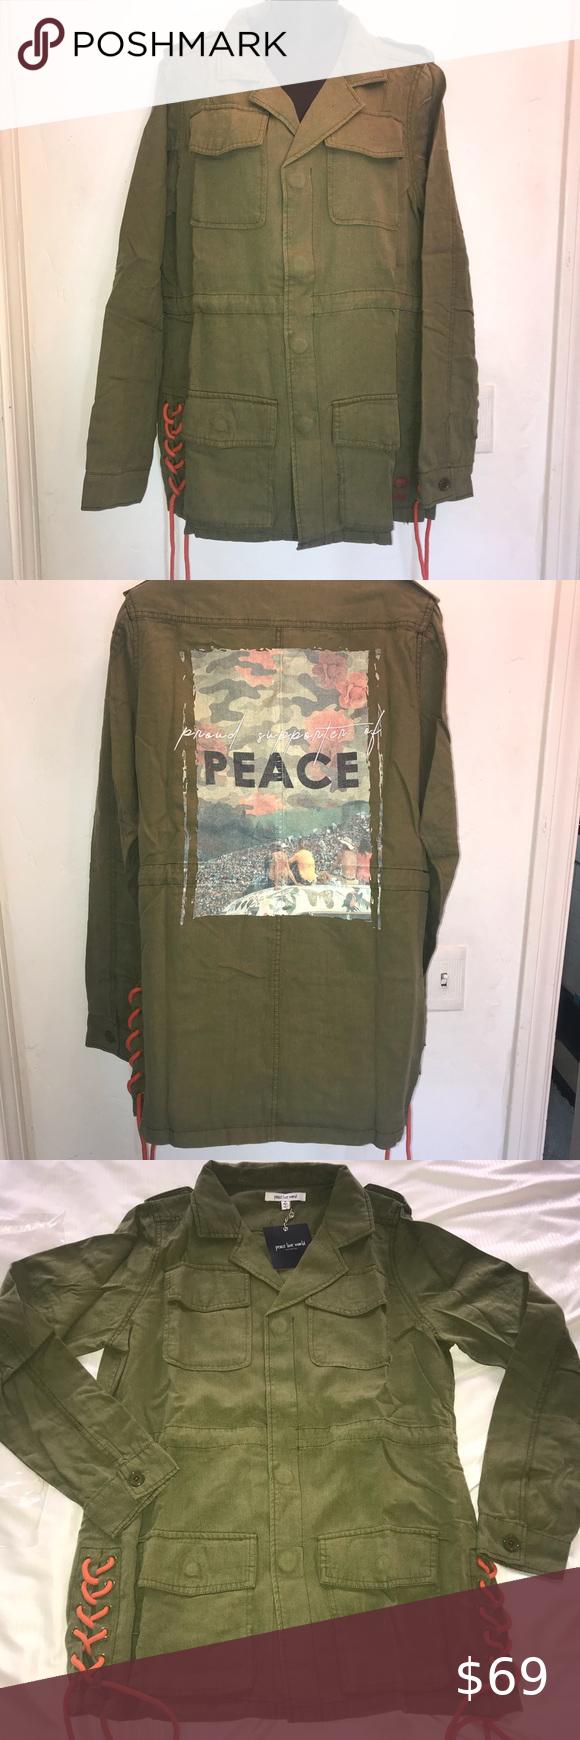 Nwt Peace Love World Scott Army Jacket All Size Army Jacket Peace Love World Clothes Design [ 1740 x 580 Pixel ]